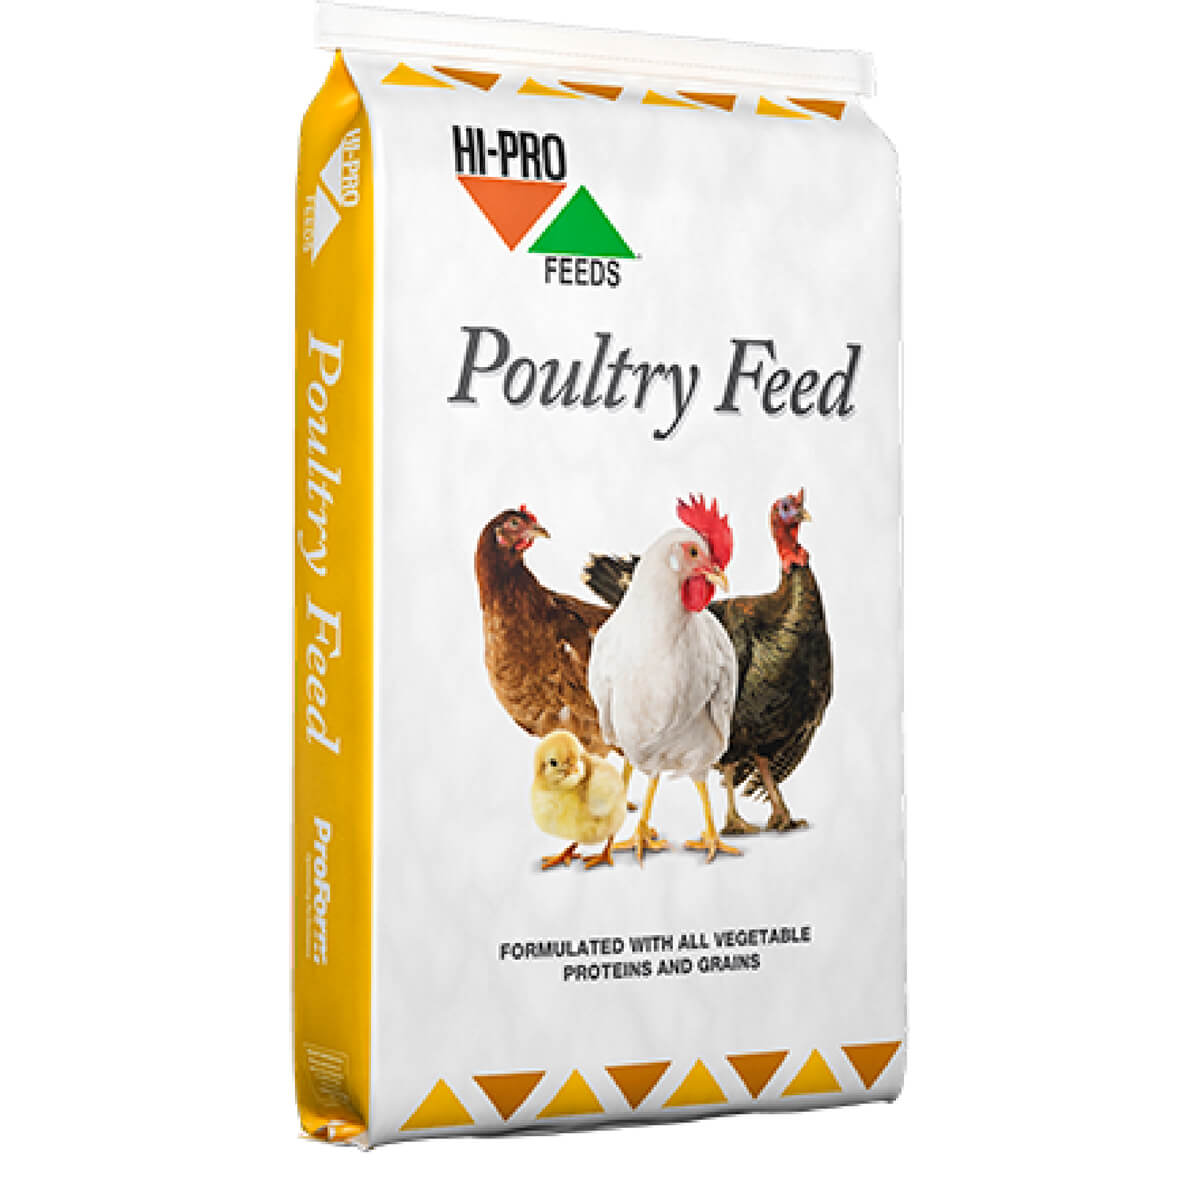 Turkey Grower - Hi-Pro 22% - 20 kg